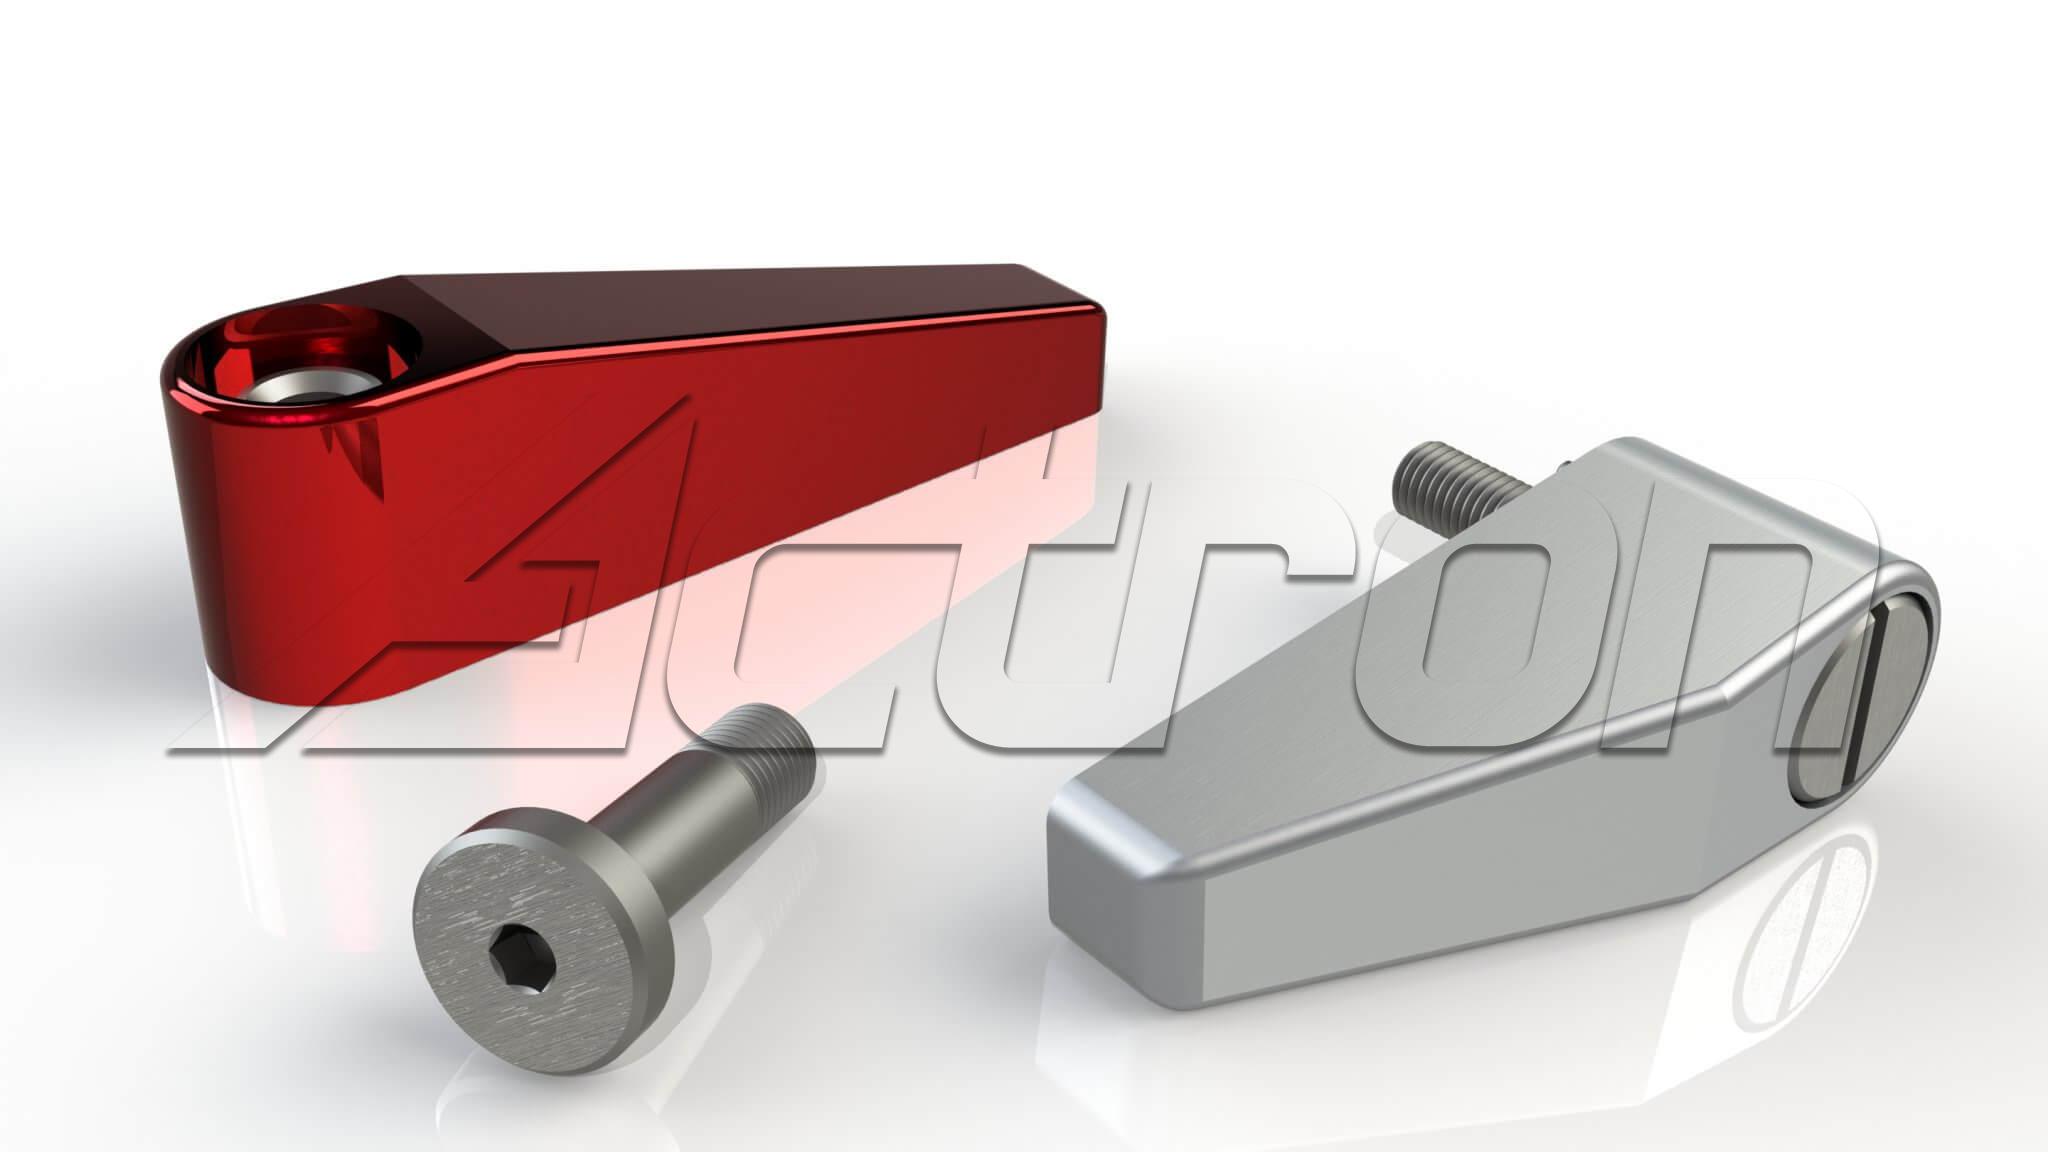 1-4-turn-retainer-4673-a35658.jpg